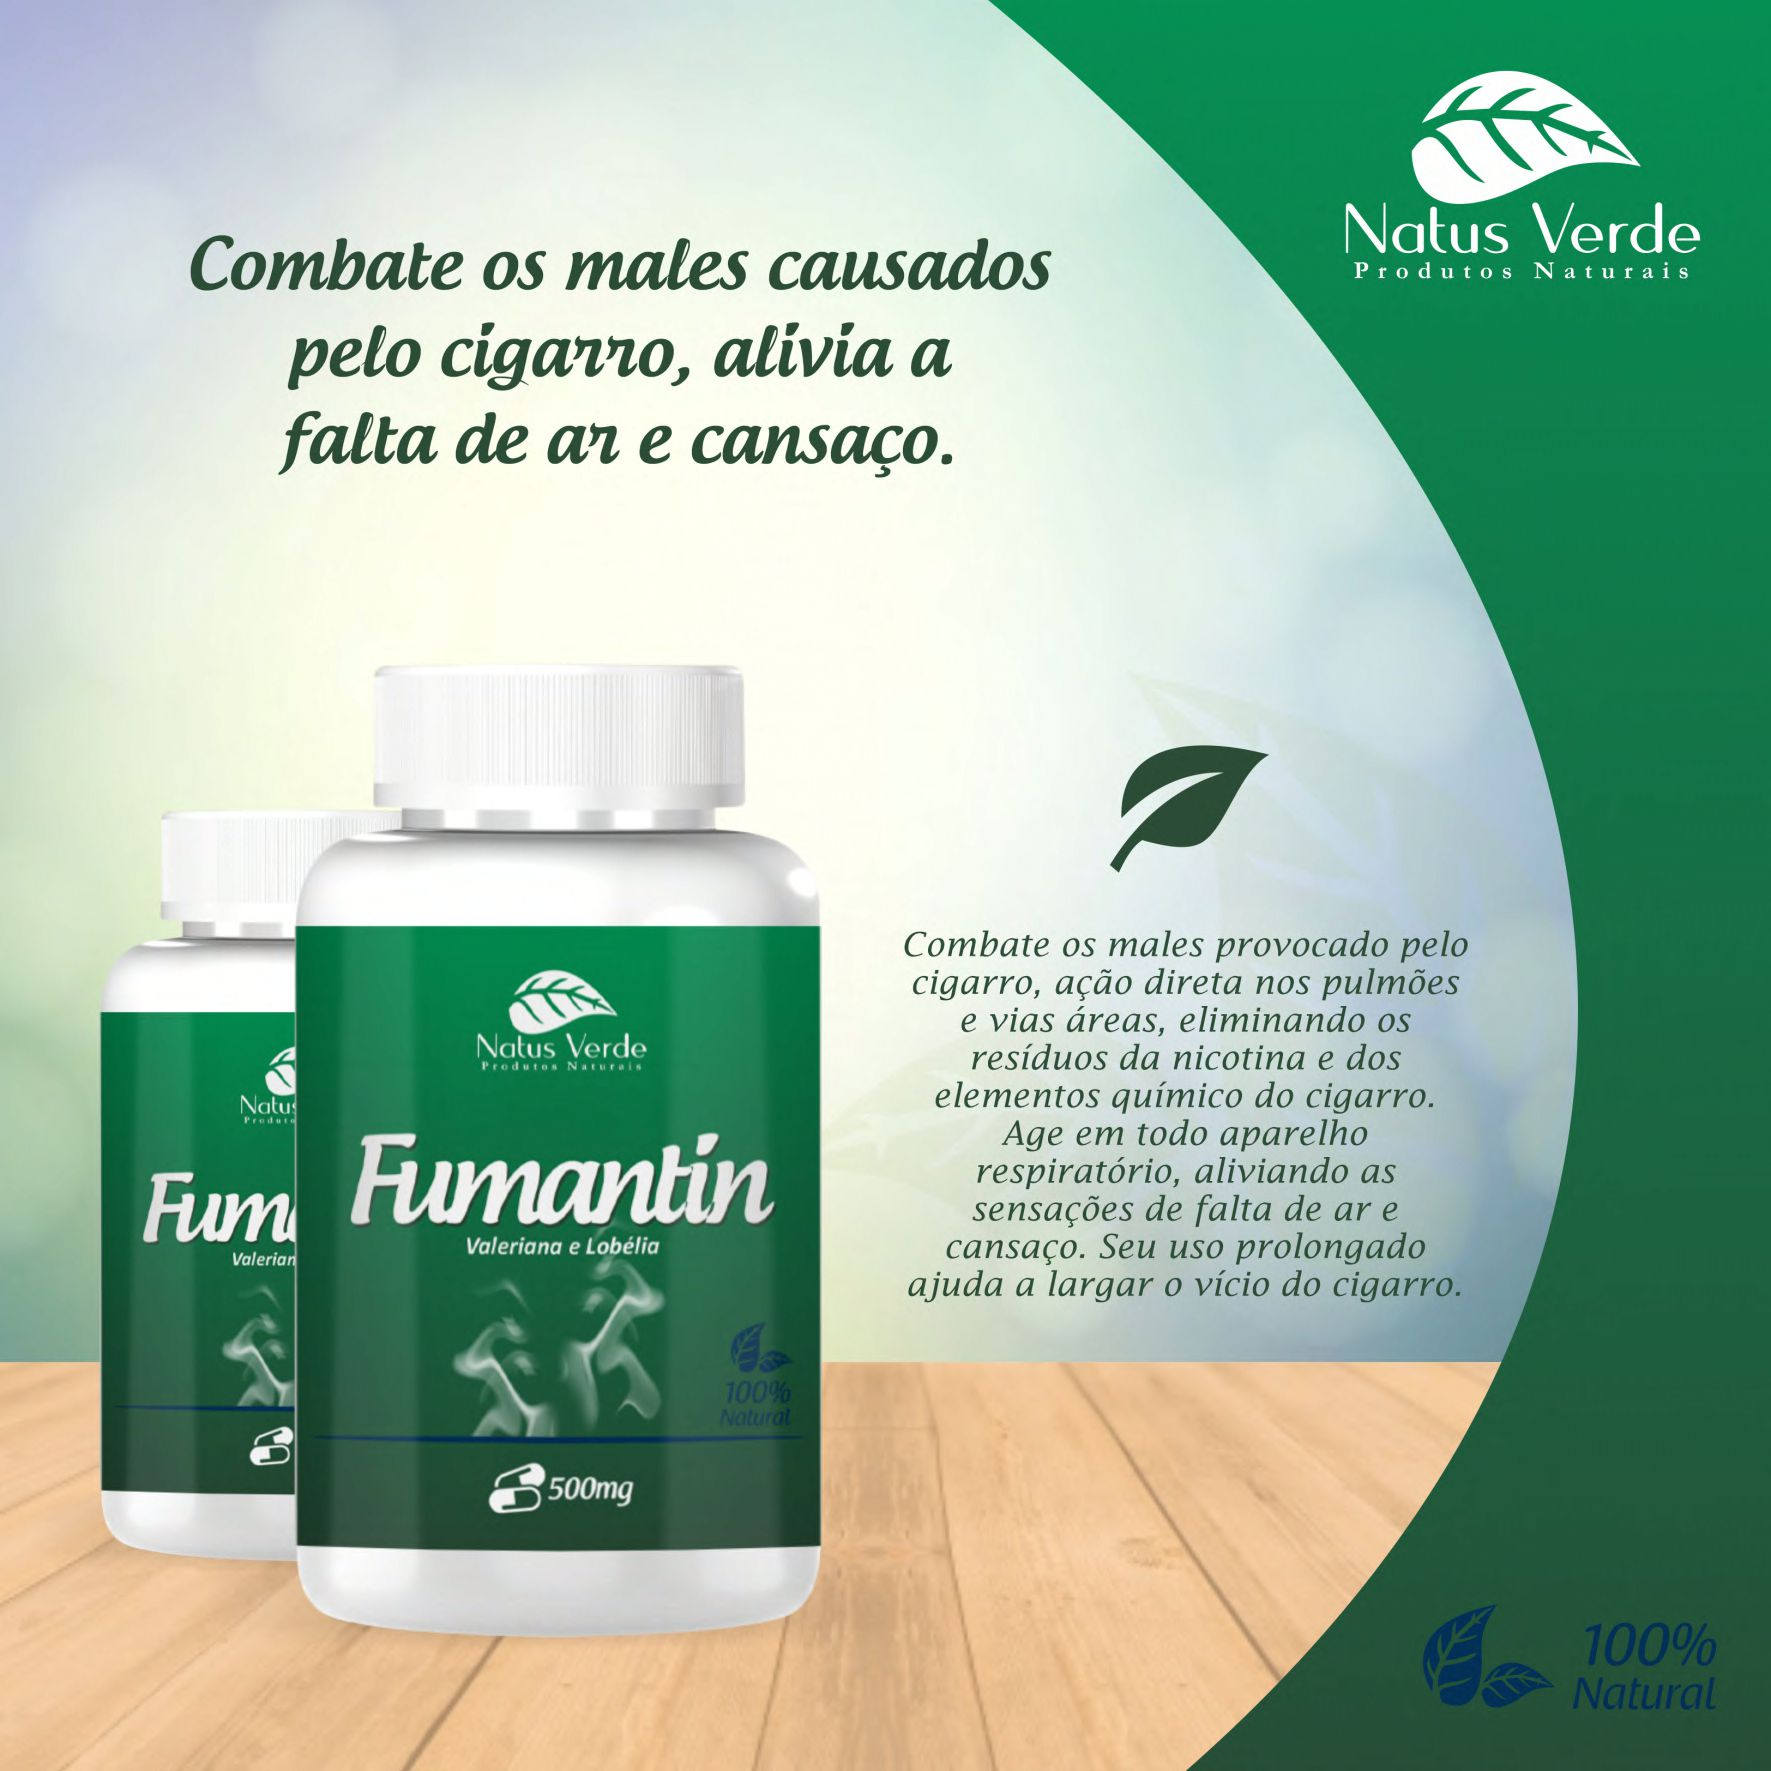 Produto Antitabagista Fumantin 60 Caps Natus Verde  - Fribasex - Fabricasex.com